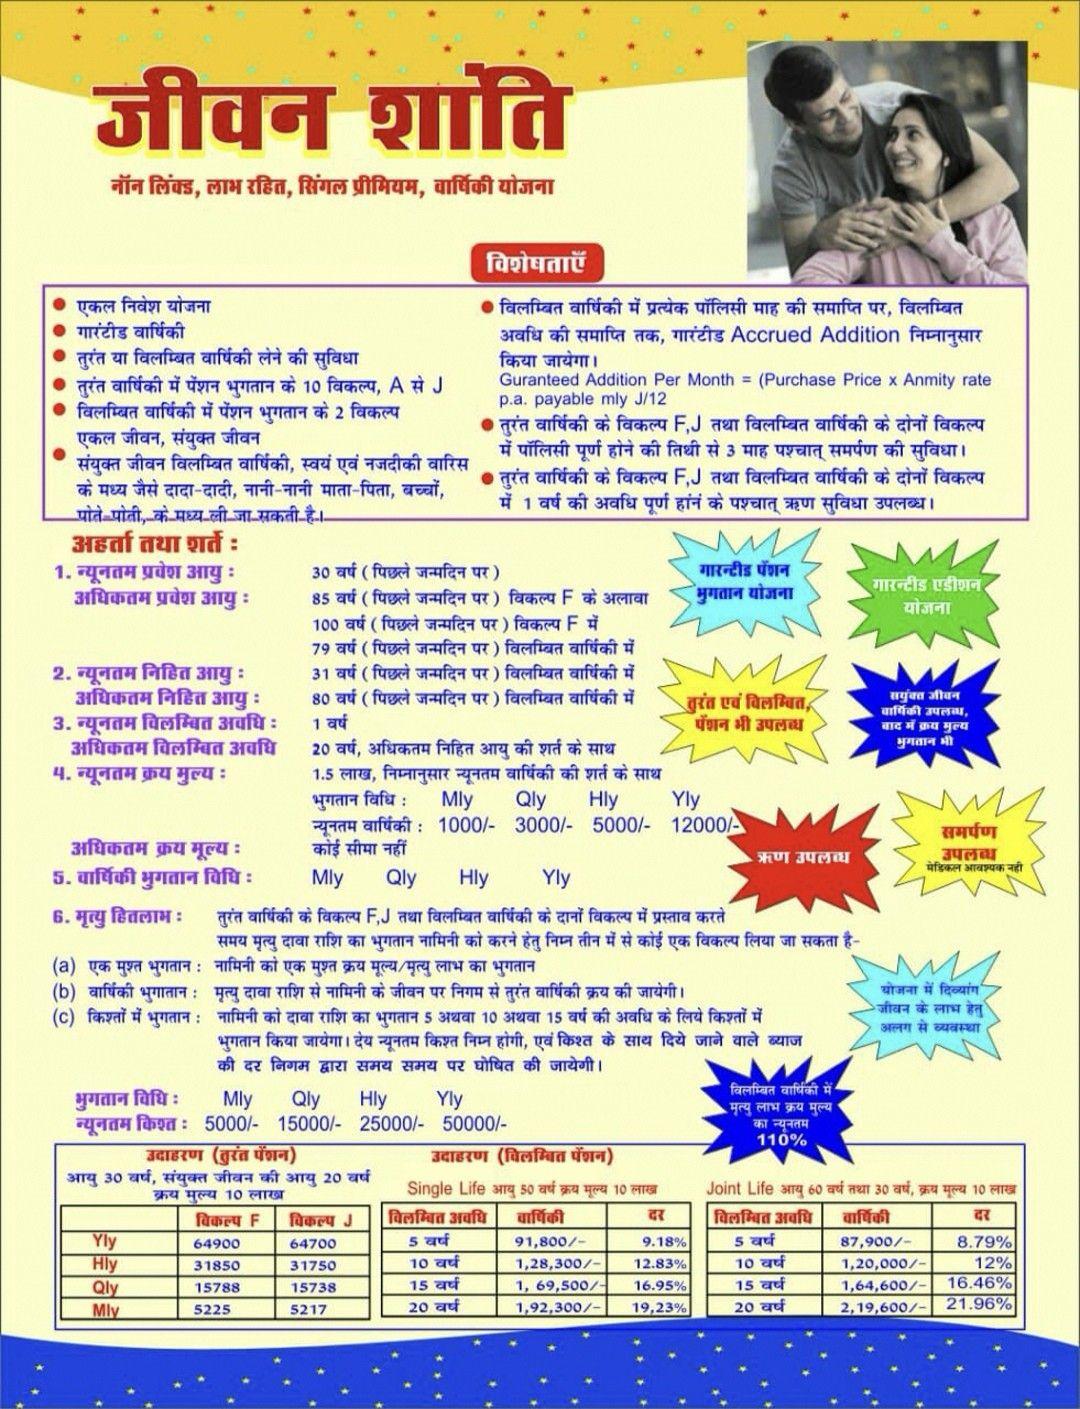 Jeevan Shanti Plan Table 850 Insurance investments